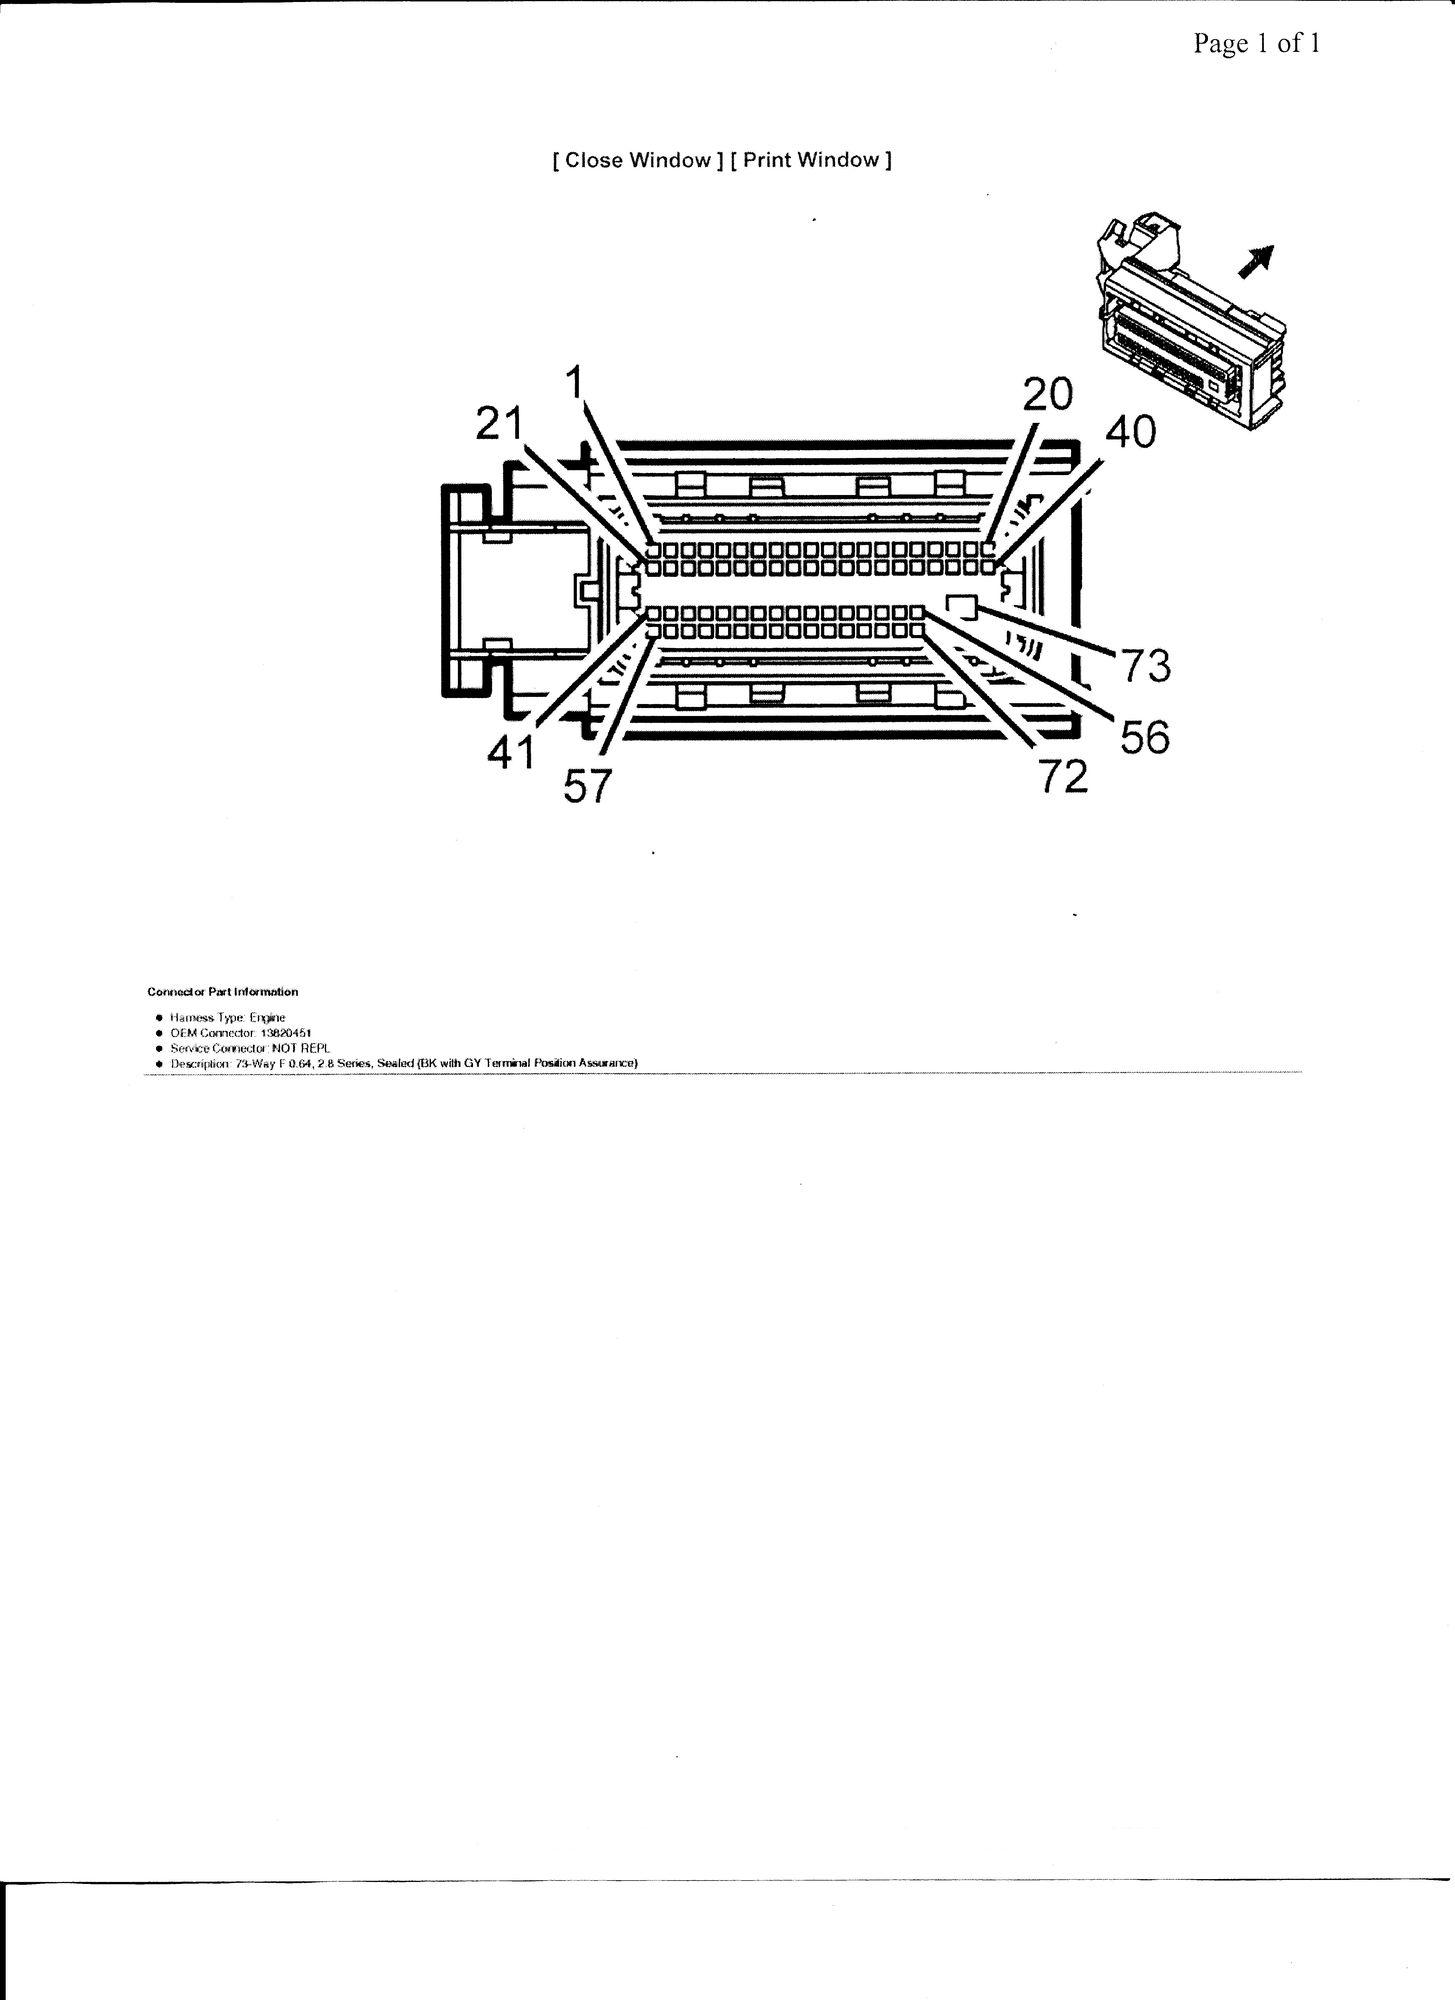 2014 l83 5 3 direct injection e92 ecm pin outs